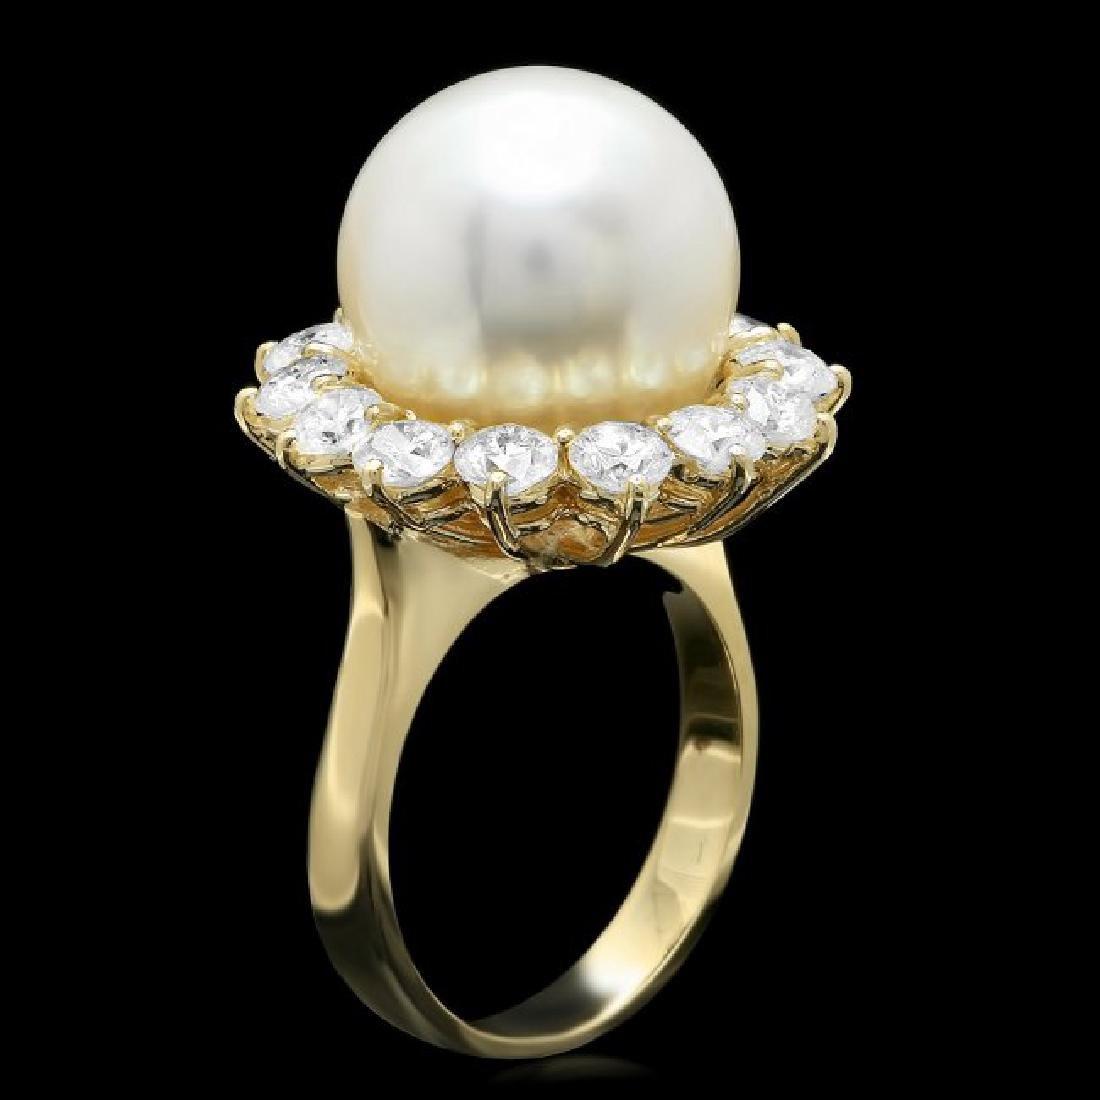 14k Gold 13 X 13mm Pearl 2.00ct Diamond Ring - 2